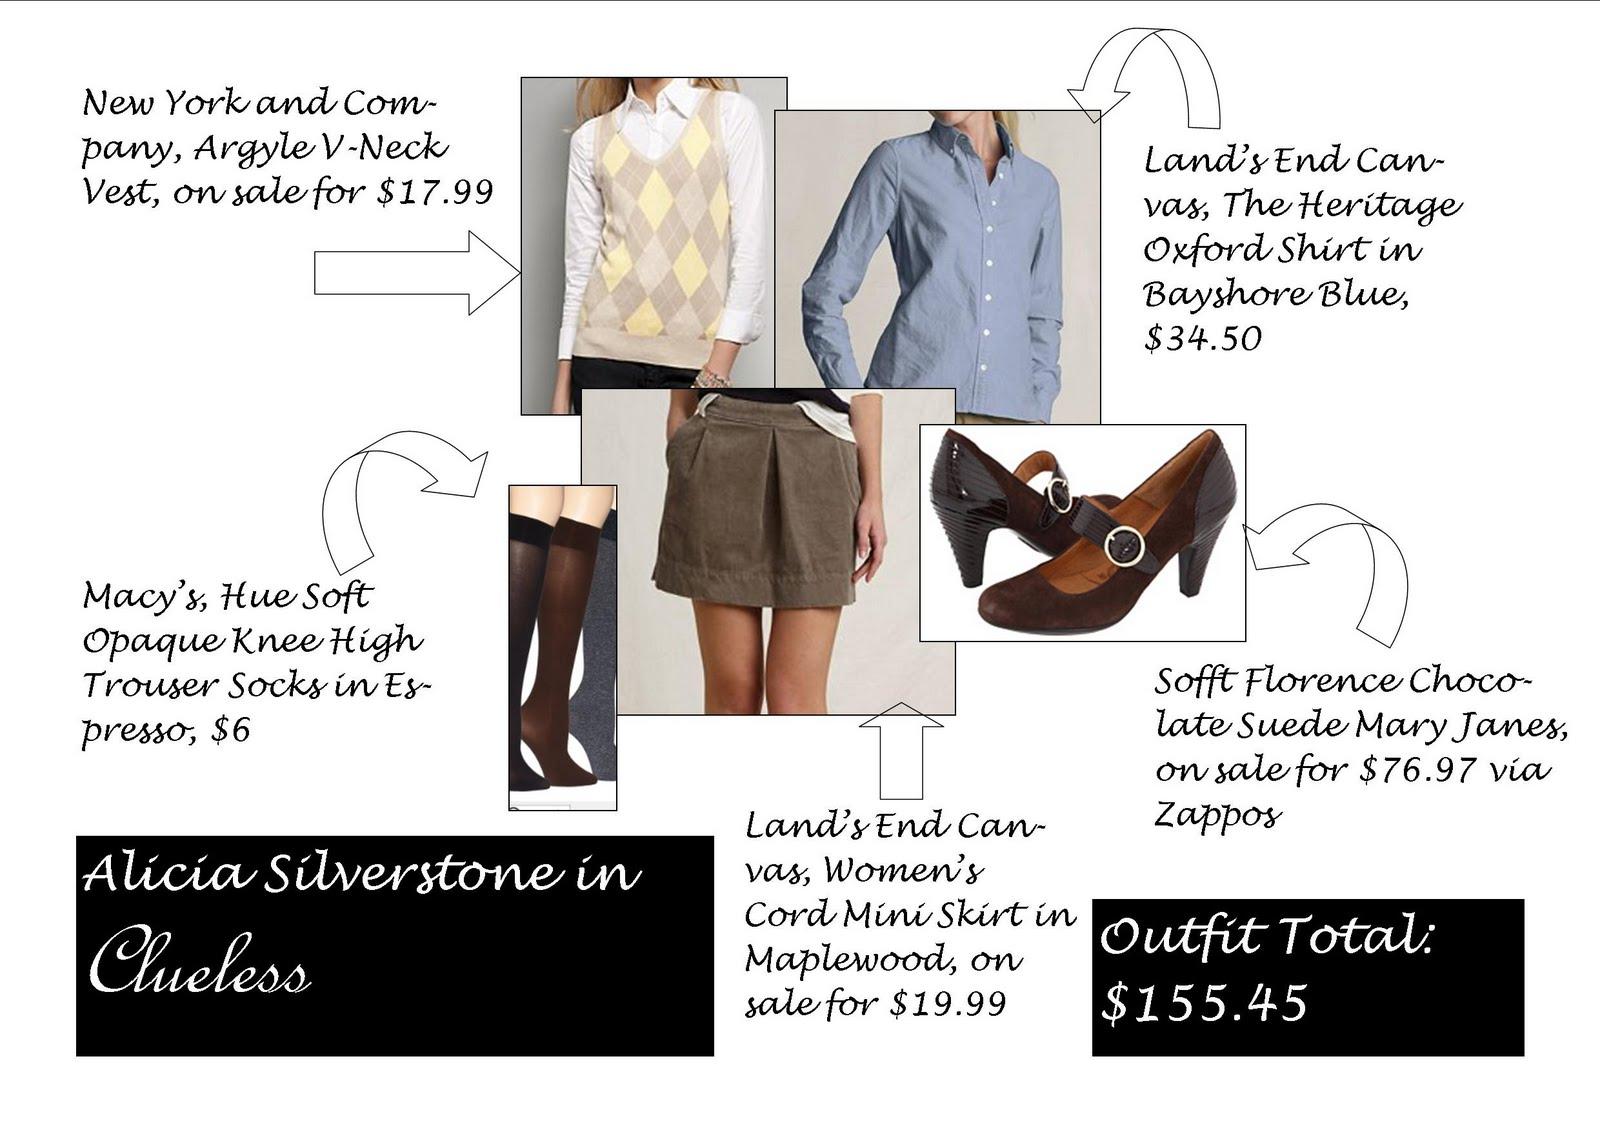 http://2.bp.blogspot.com/-4ZEqdgK1Bj4/TcgGvk6kmXI/AAAAAAAAAos/1Z7hbVnh7eA/s1600/Alicia+Silverstone+Clueless.jpg